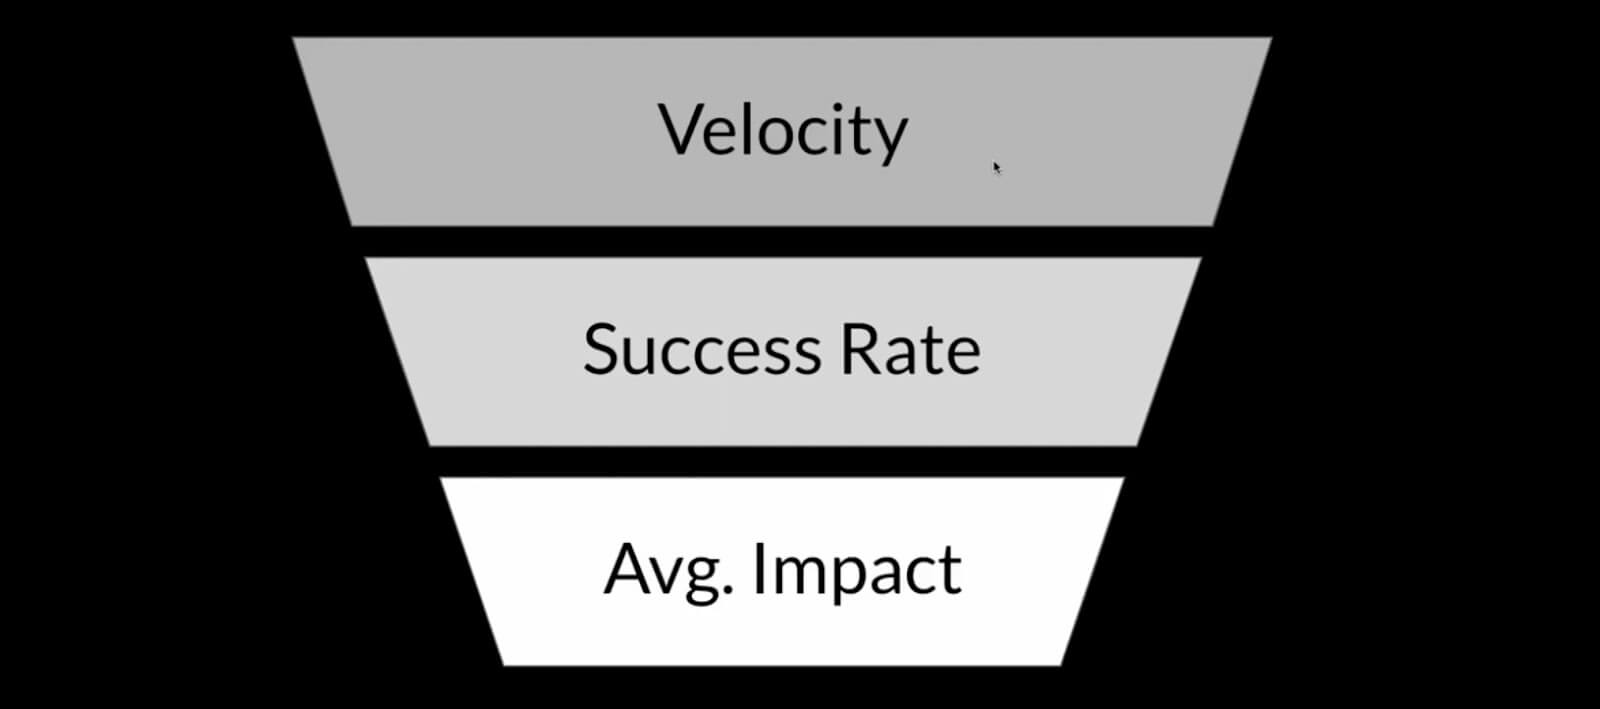 velocity, success rate, avg. impact